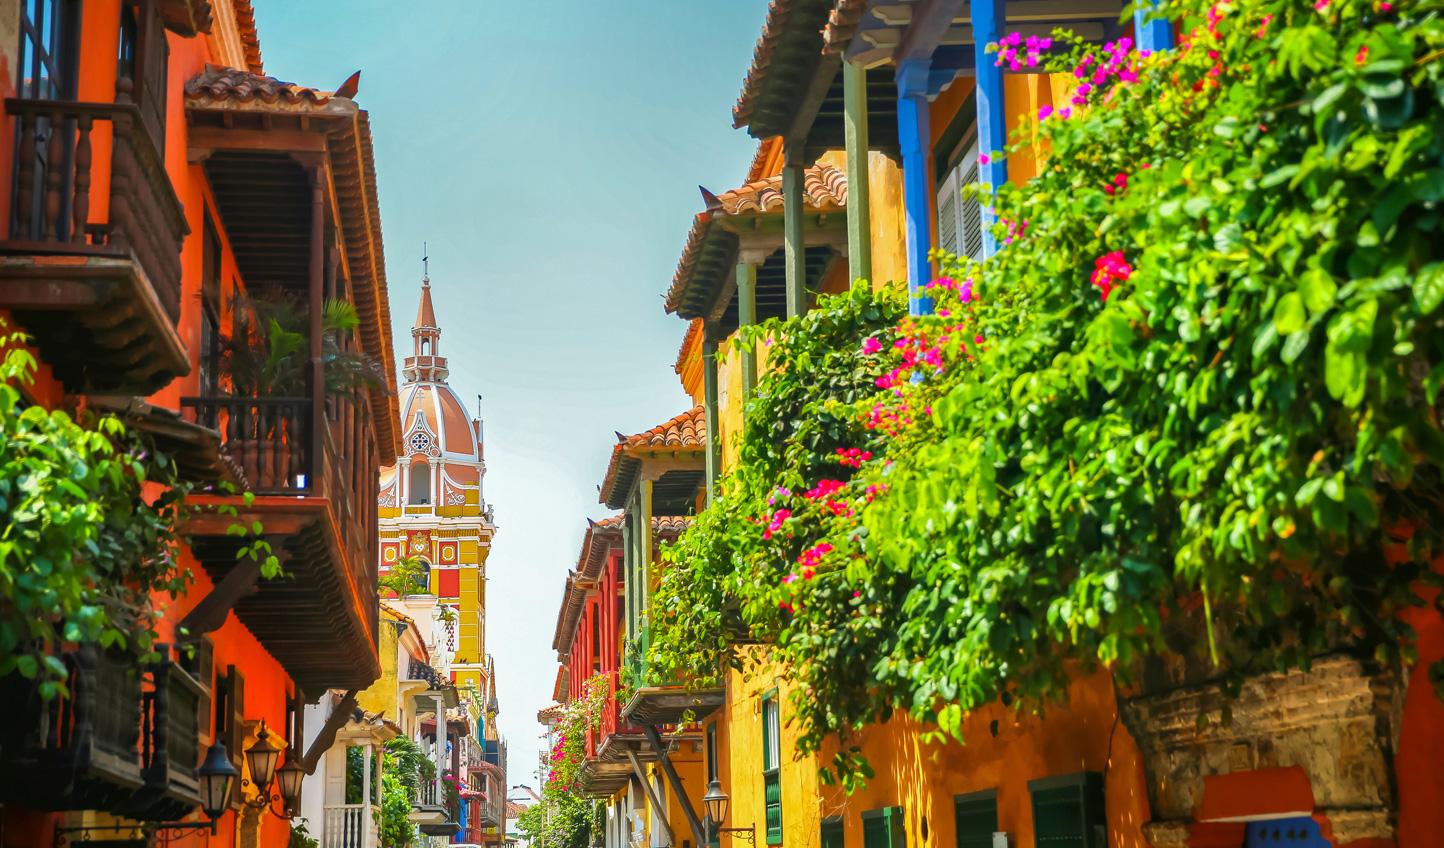 Explore the cobblestone streets of Cartagena